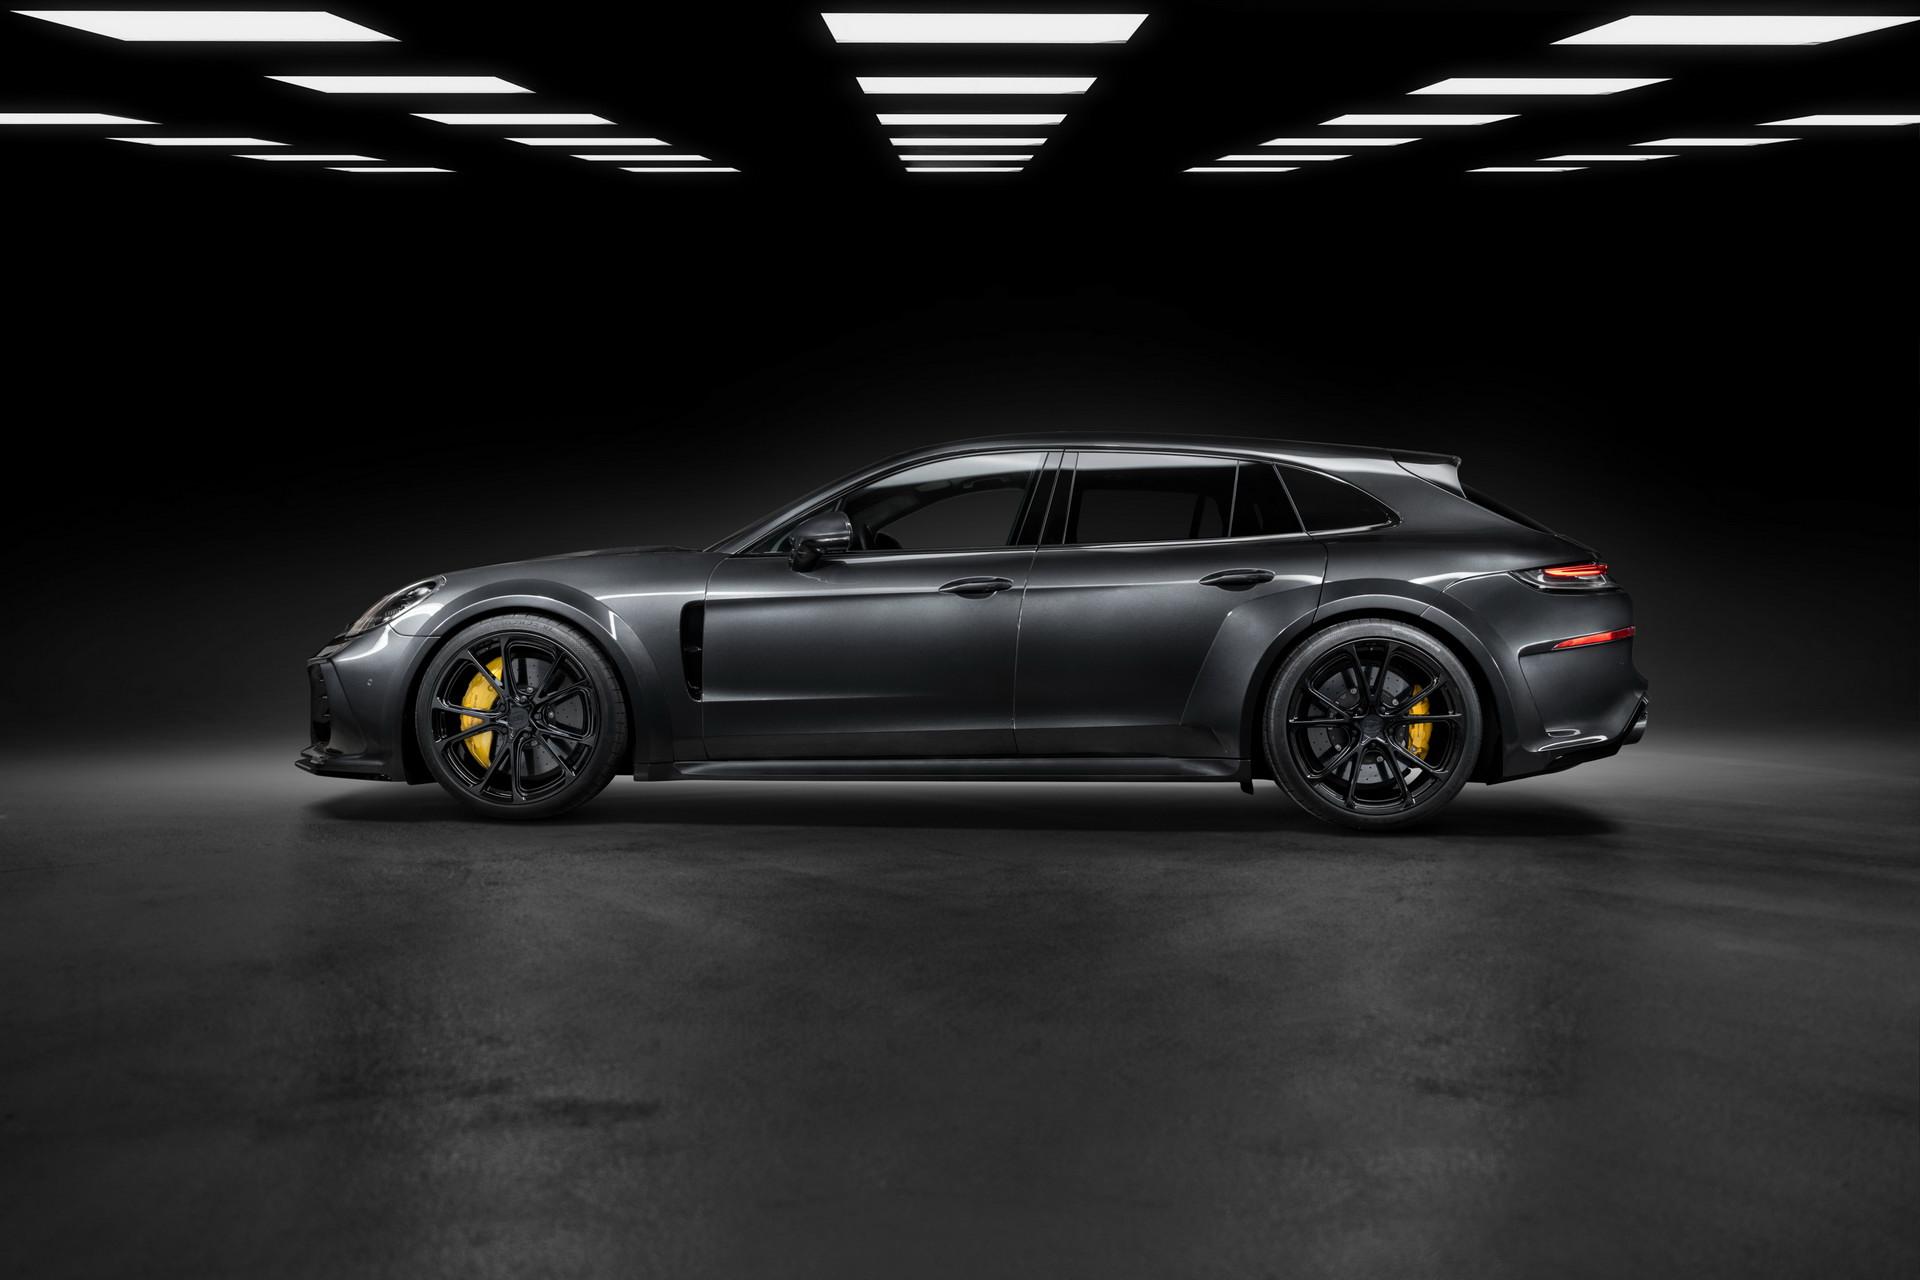 Porsche Panamera Techart Personalizacion (15)